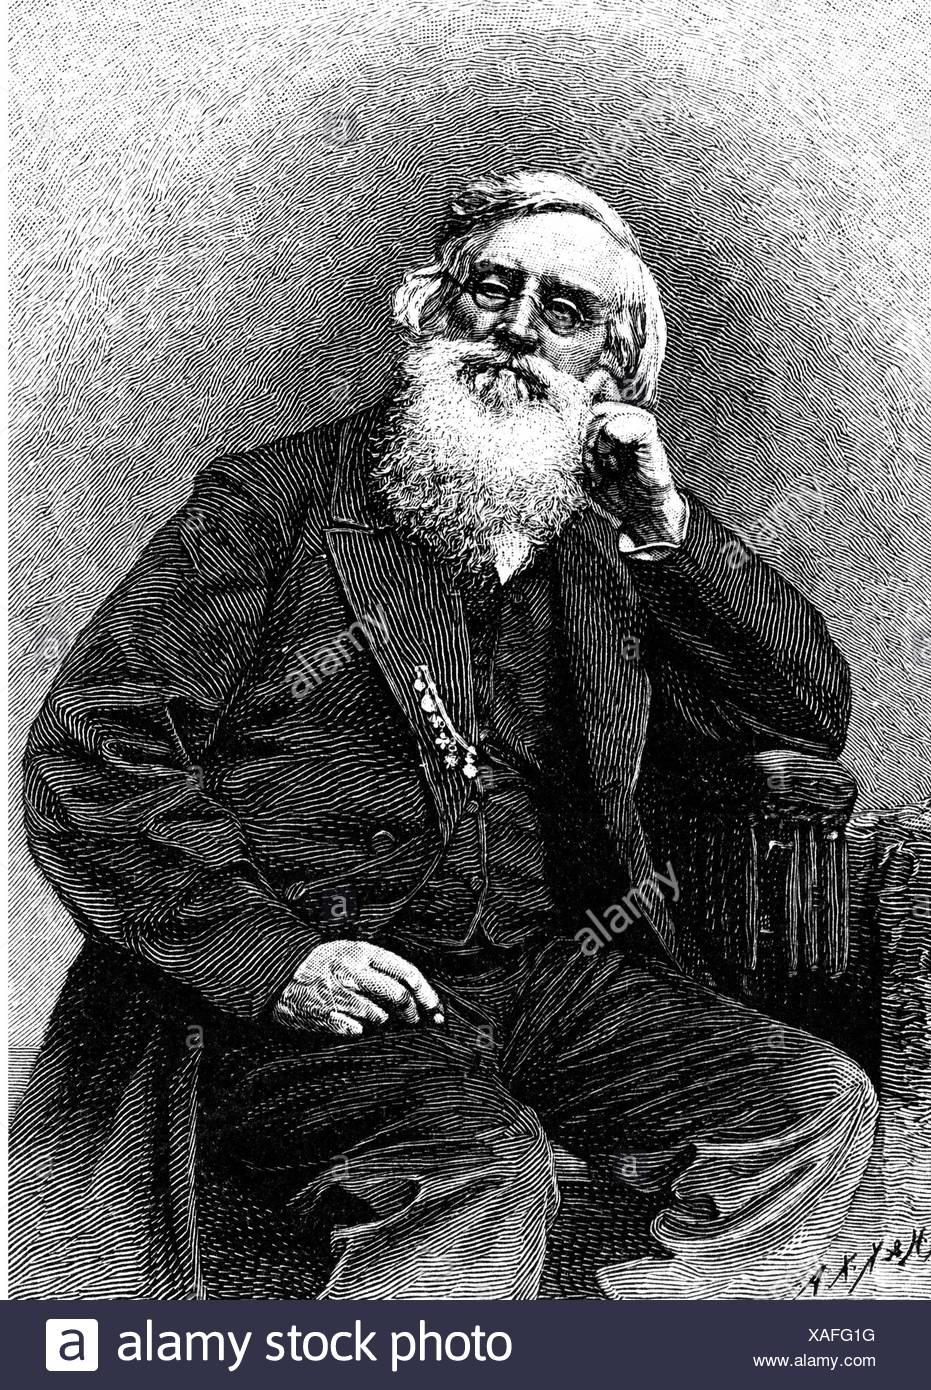 Morse, Samuel, 27.4.1791 - 2.4.1872, American inventor, half length, sitting, wood engraving, 19th century, inventor, - Stock Image